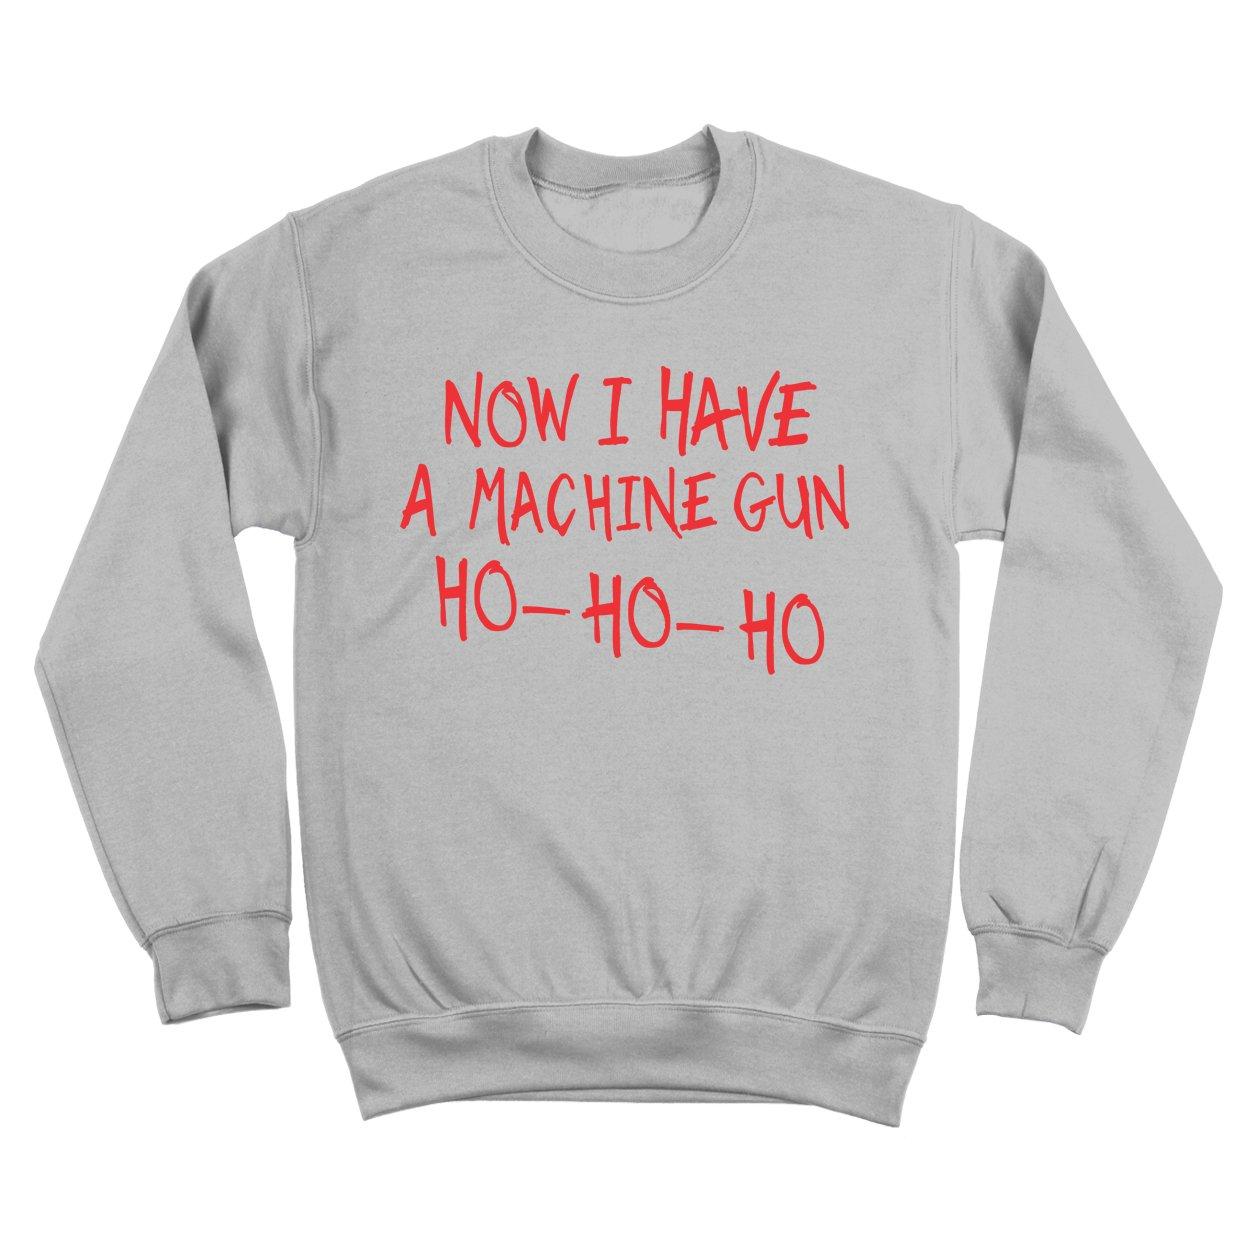 Amazon.com: Now I Have A Machine Gun Ho Ho Ho Funny Christmas John ...